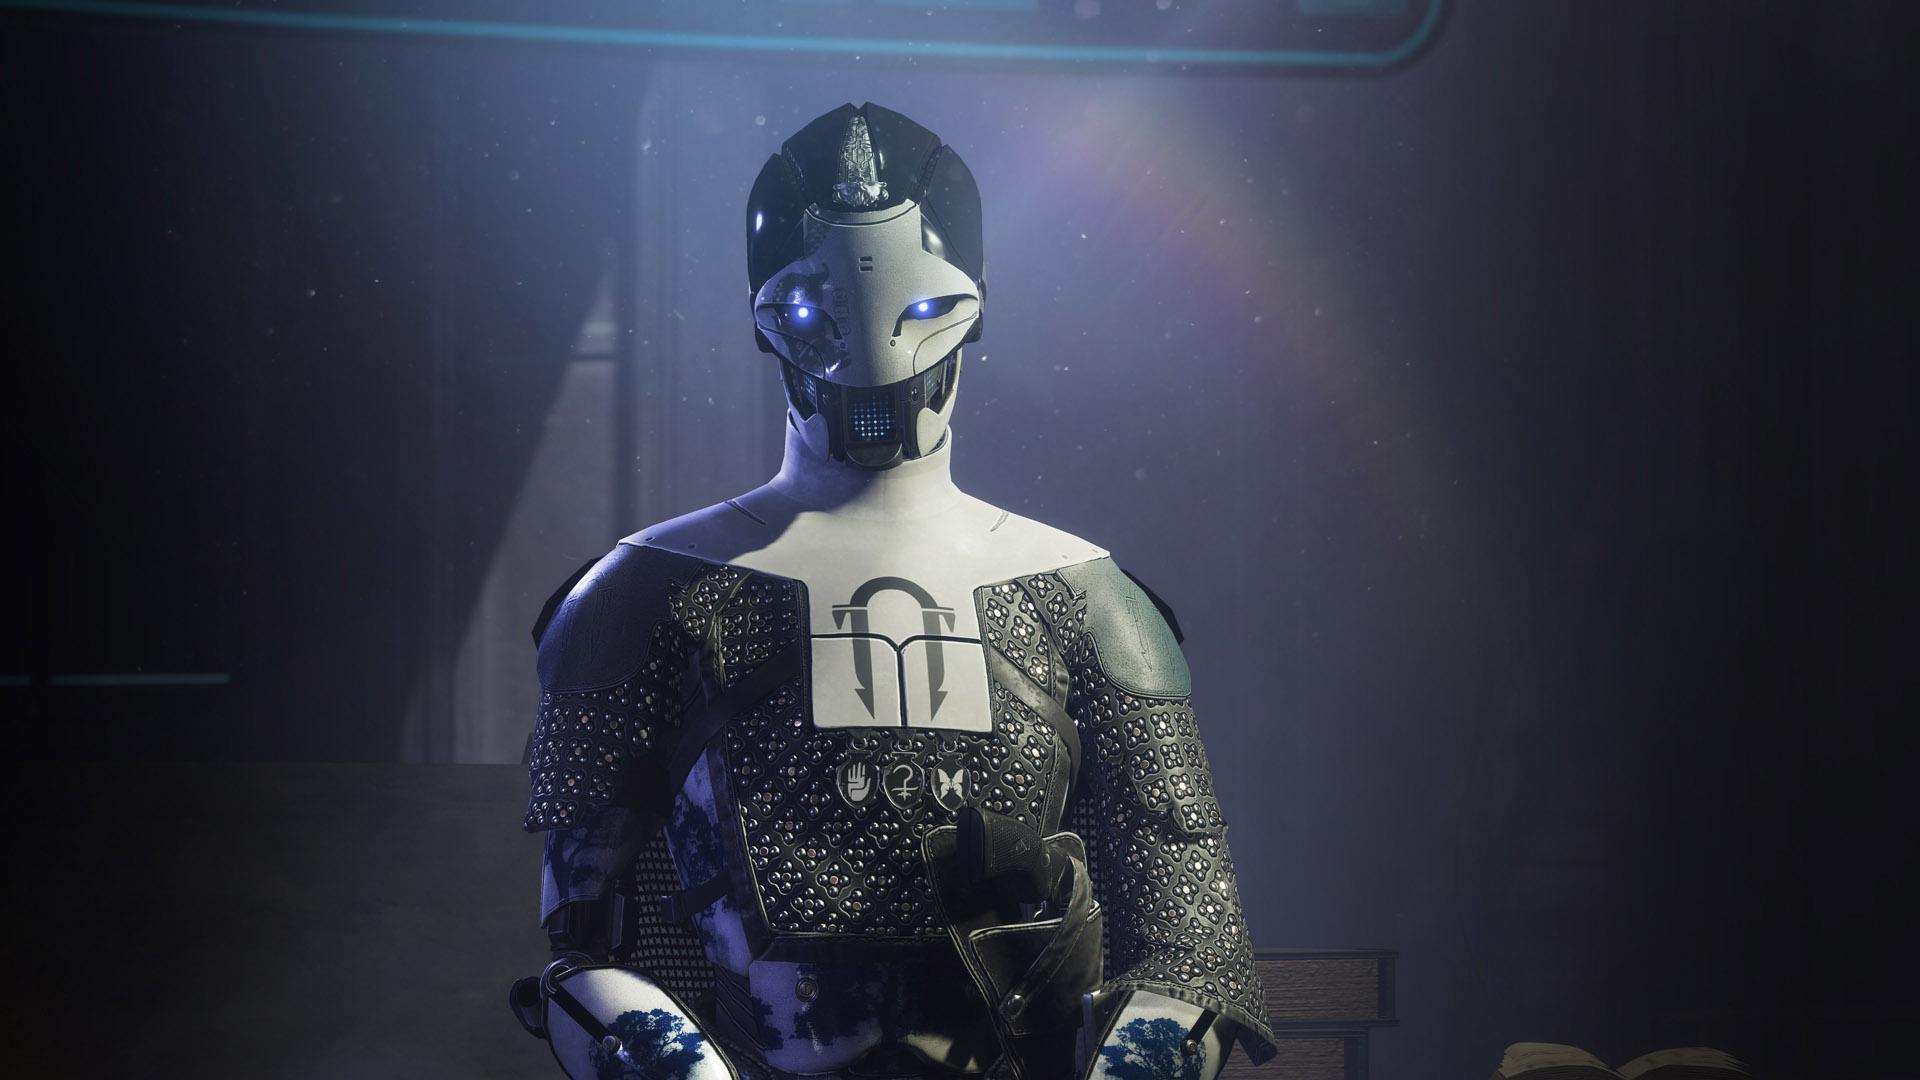 Destiny 2 Season 5 Season of the Forge